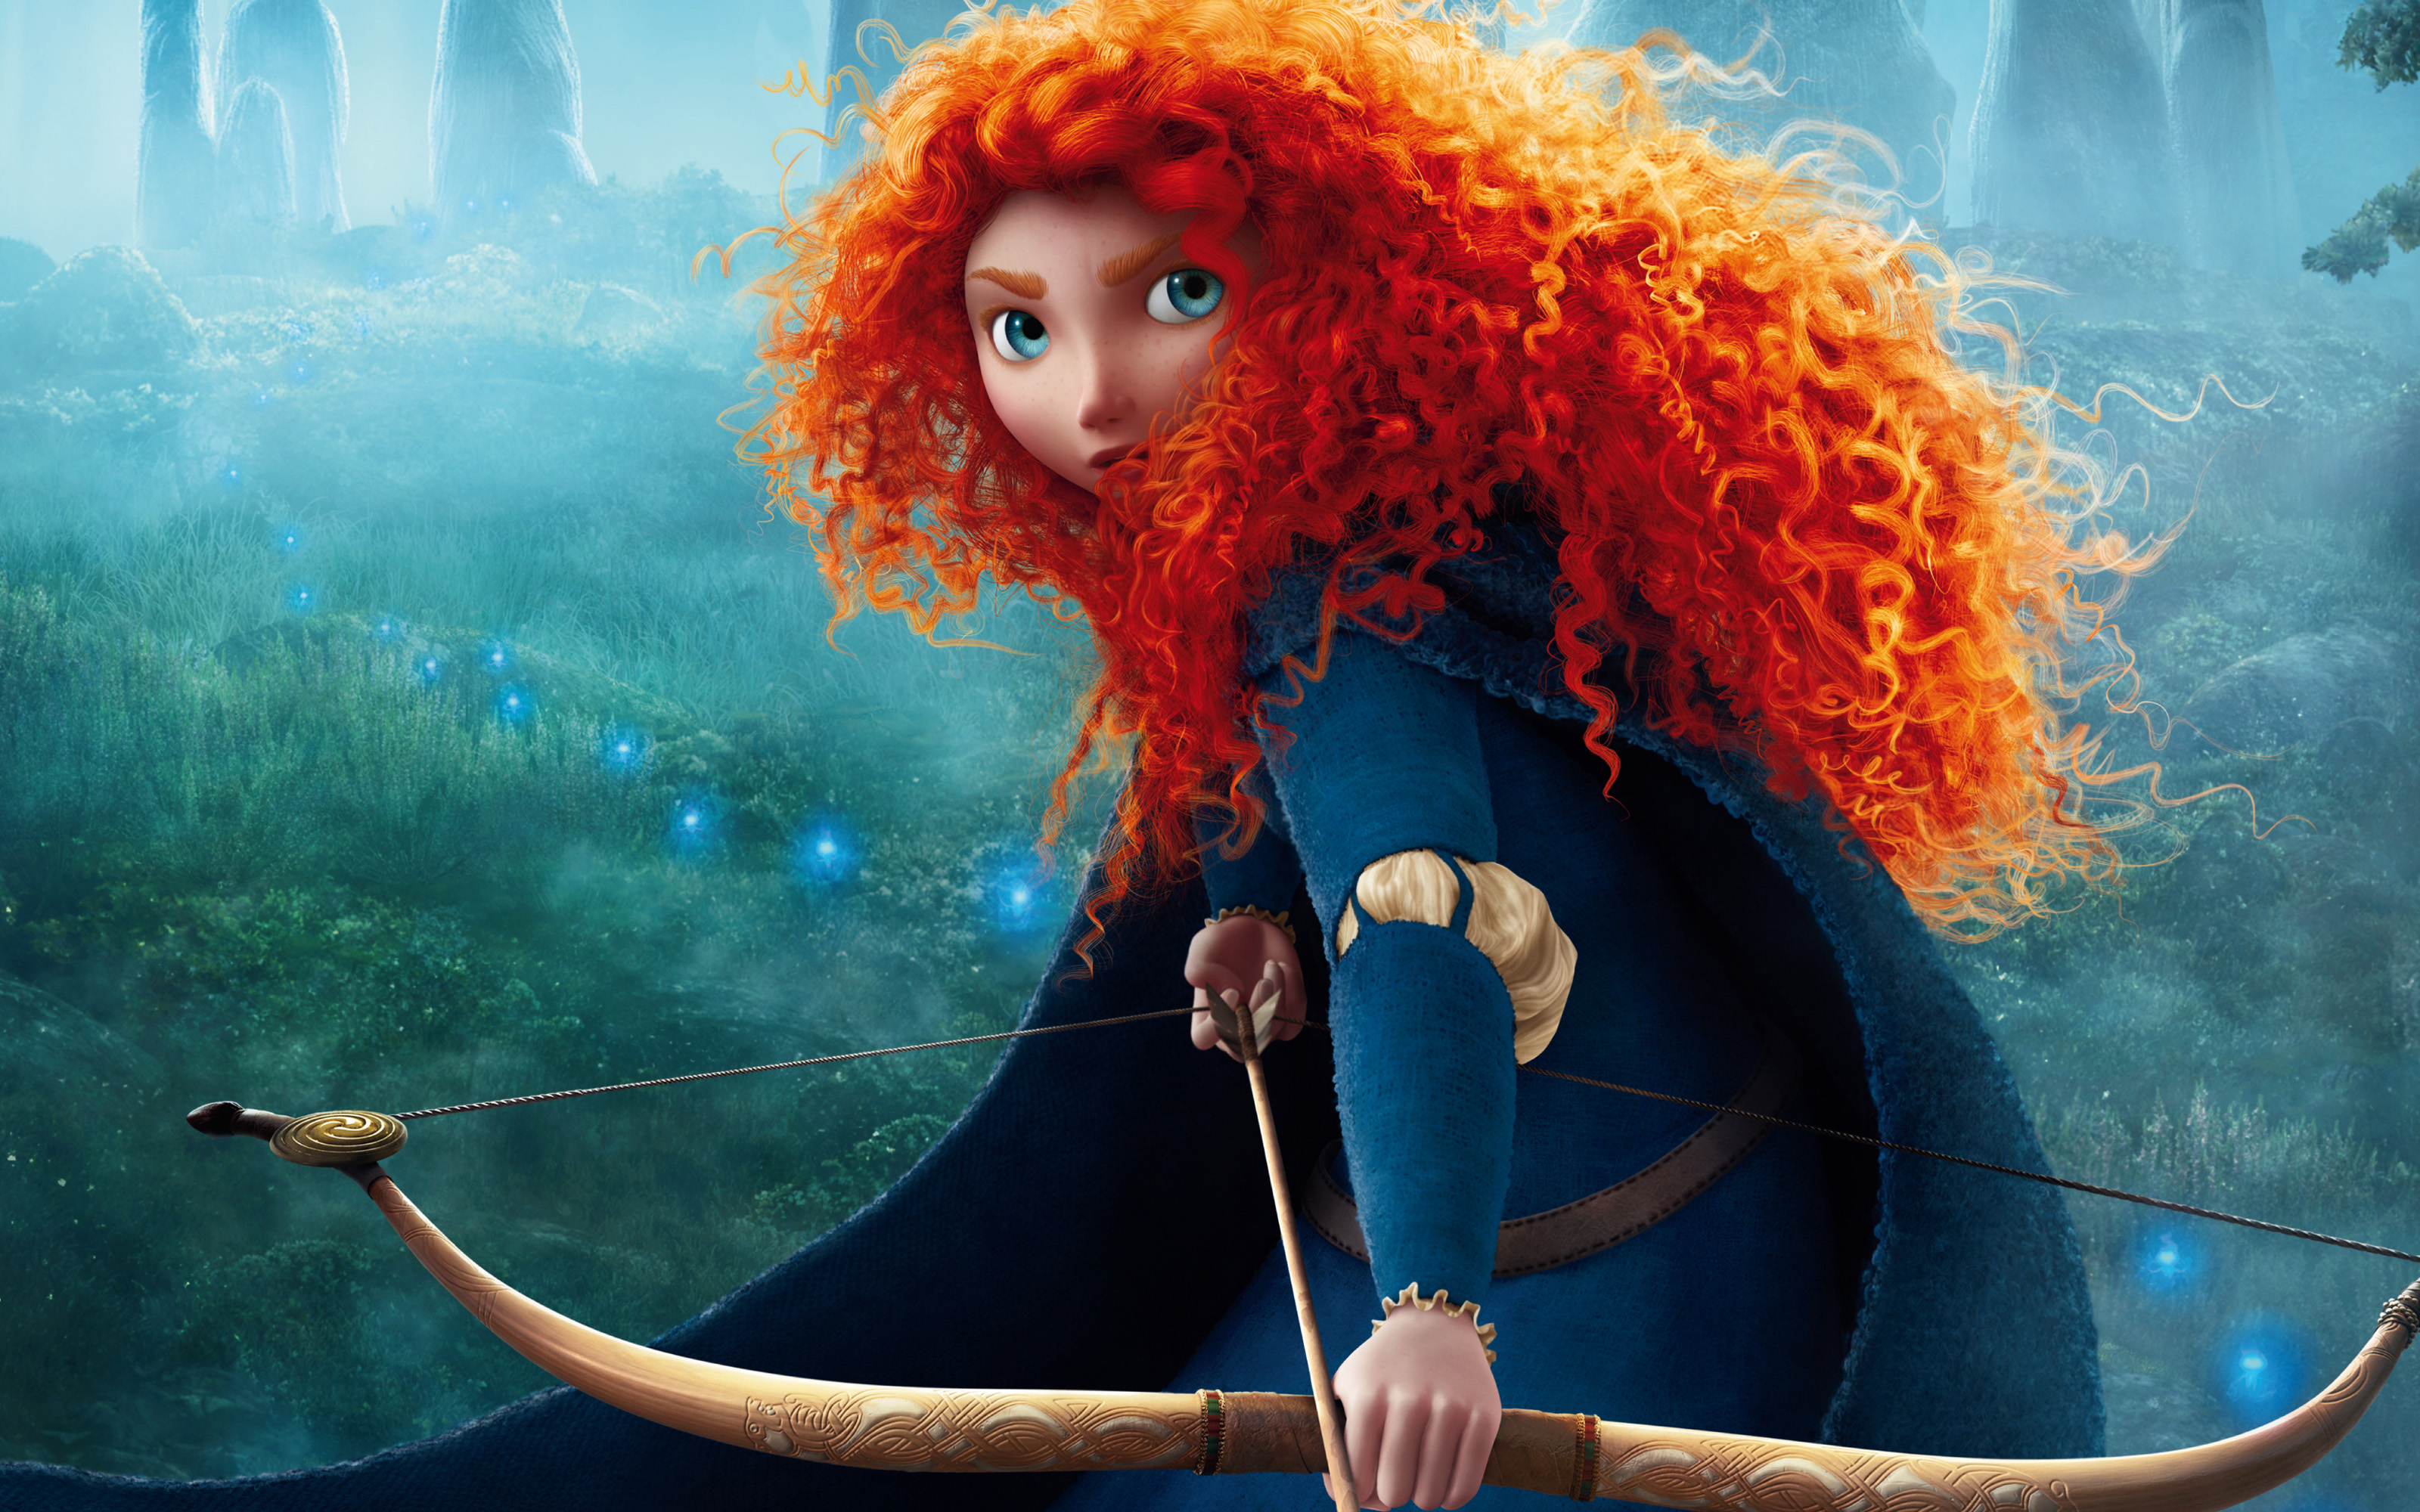 Disney channel movie ice princess